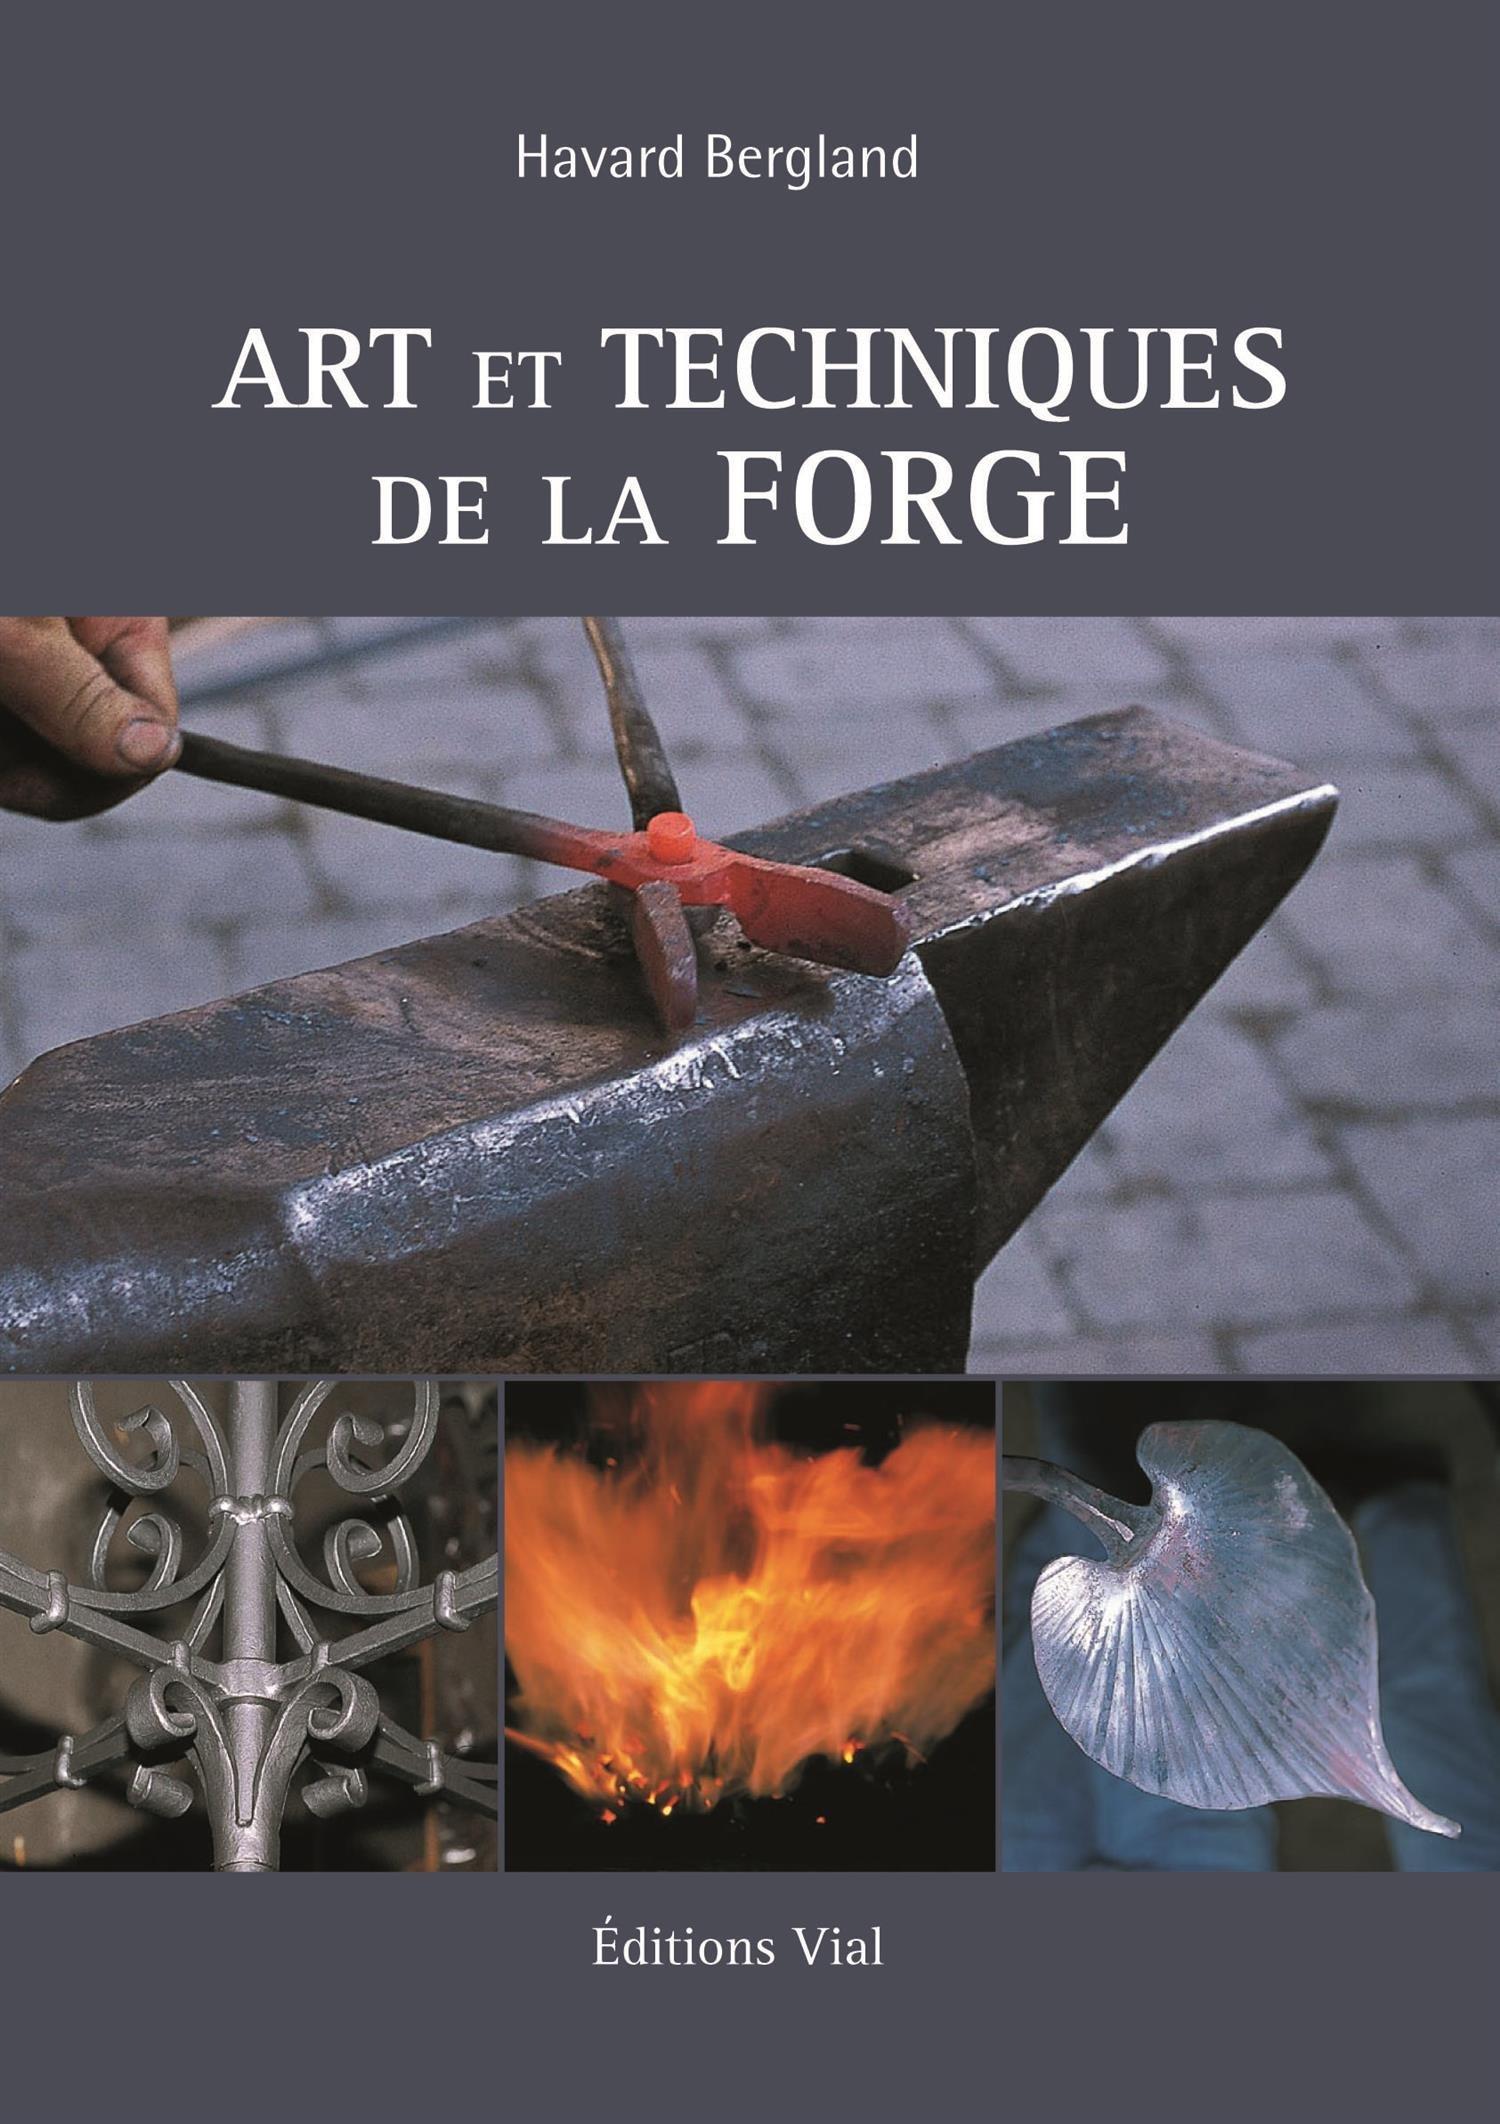 Arts et techniques de la forge: Amazon.es: Havard Bergland, Gabrielle Fornari: Libros en idiomas extranjeros